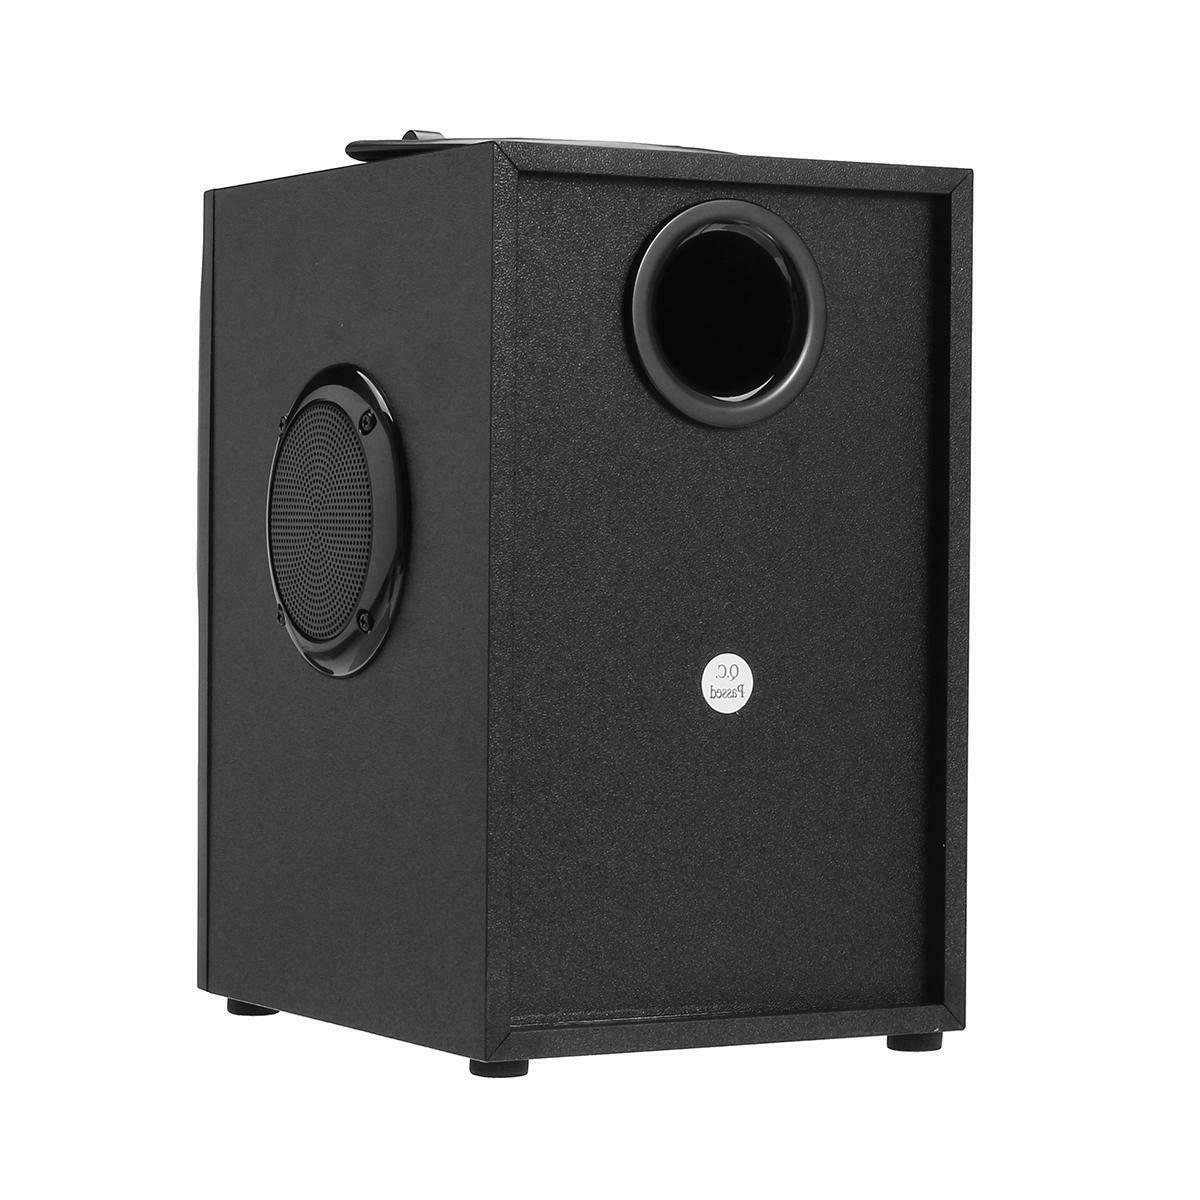 Bass Big Boombox Sound FM